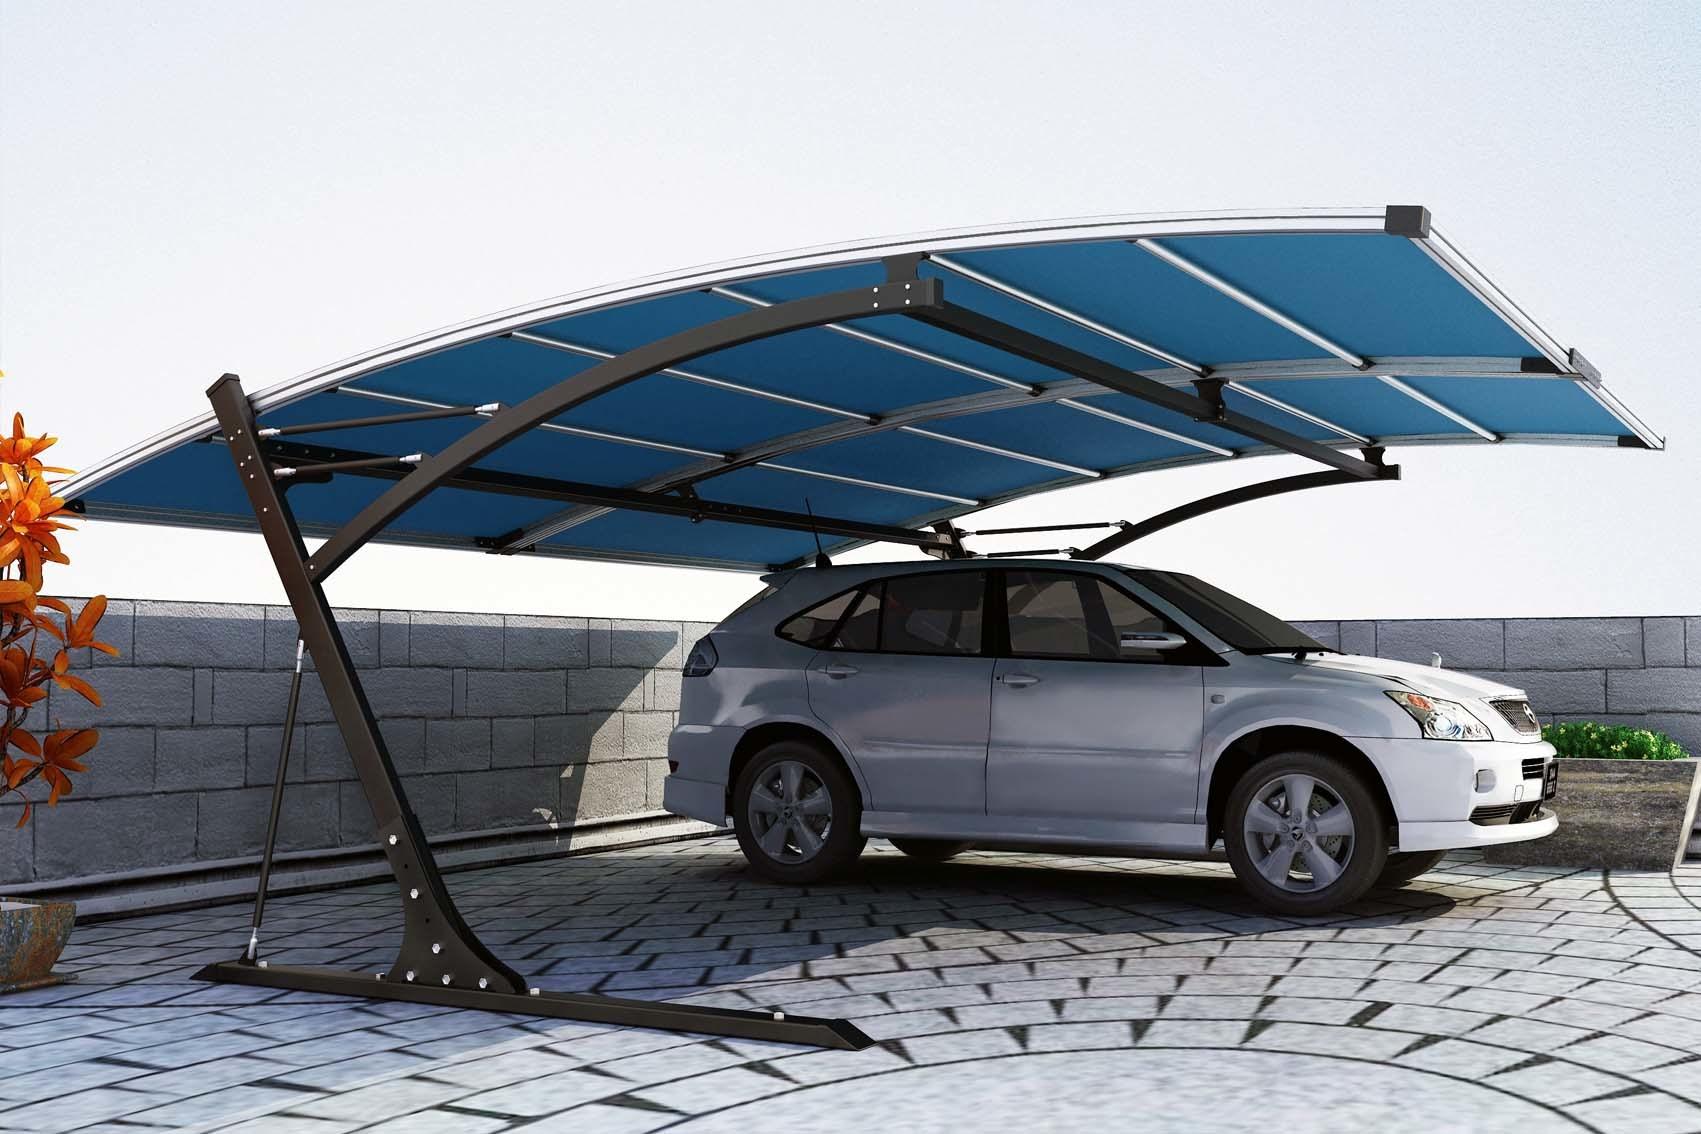 china two cars aluminum membrane carport car shelter china carport canvas top. Black Bedroom Furniture Sets. Home Design Ideas